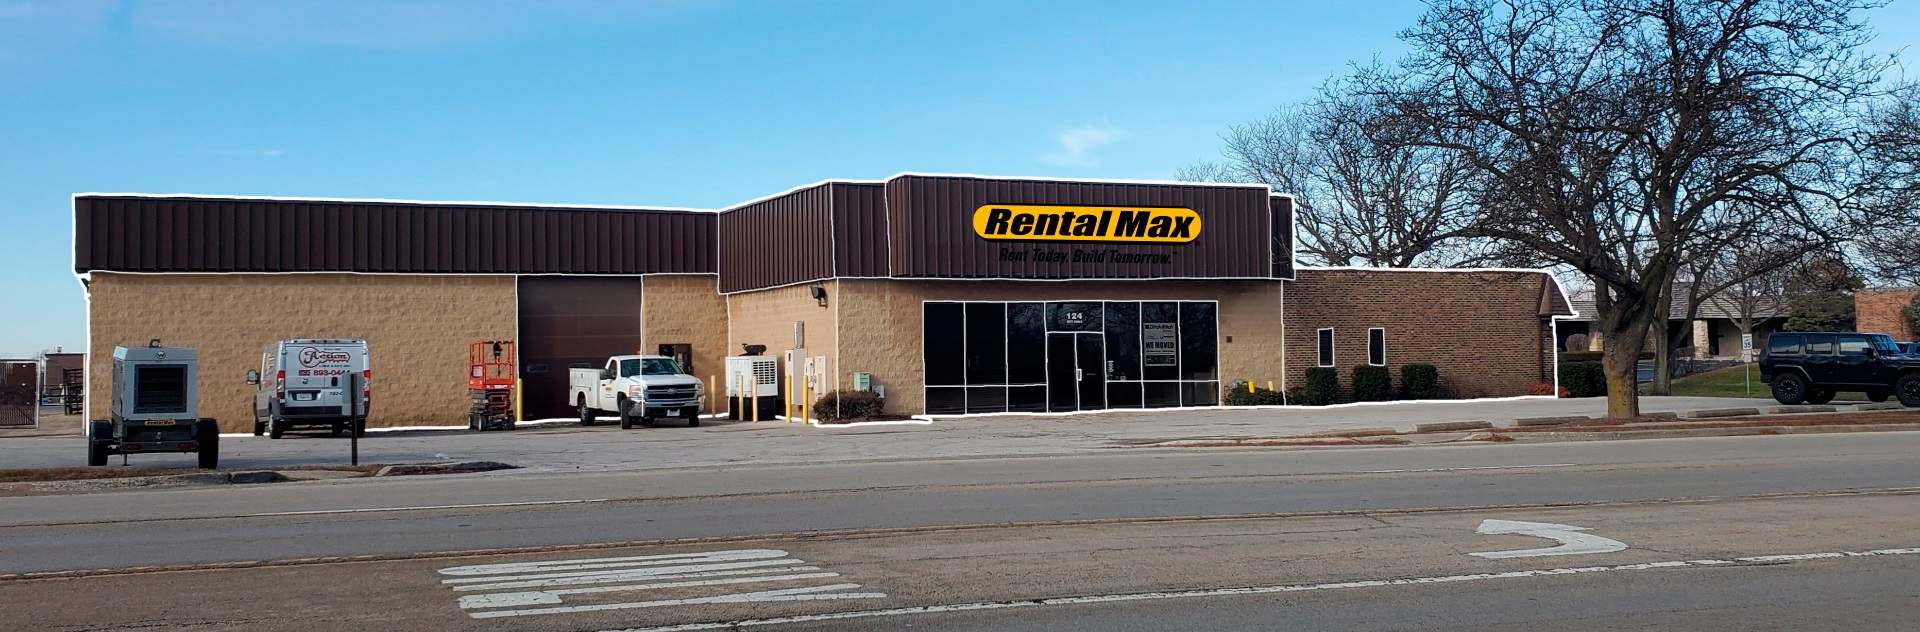 rentalmax equipment rentals for contractors homeowners serving chicago metro rentalmax equipment rentals for